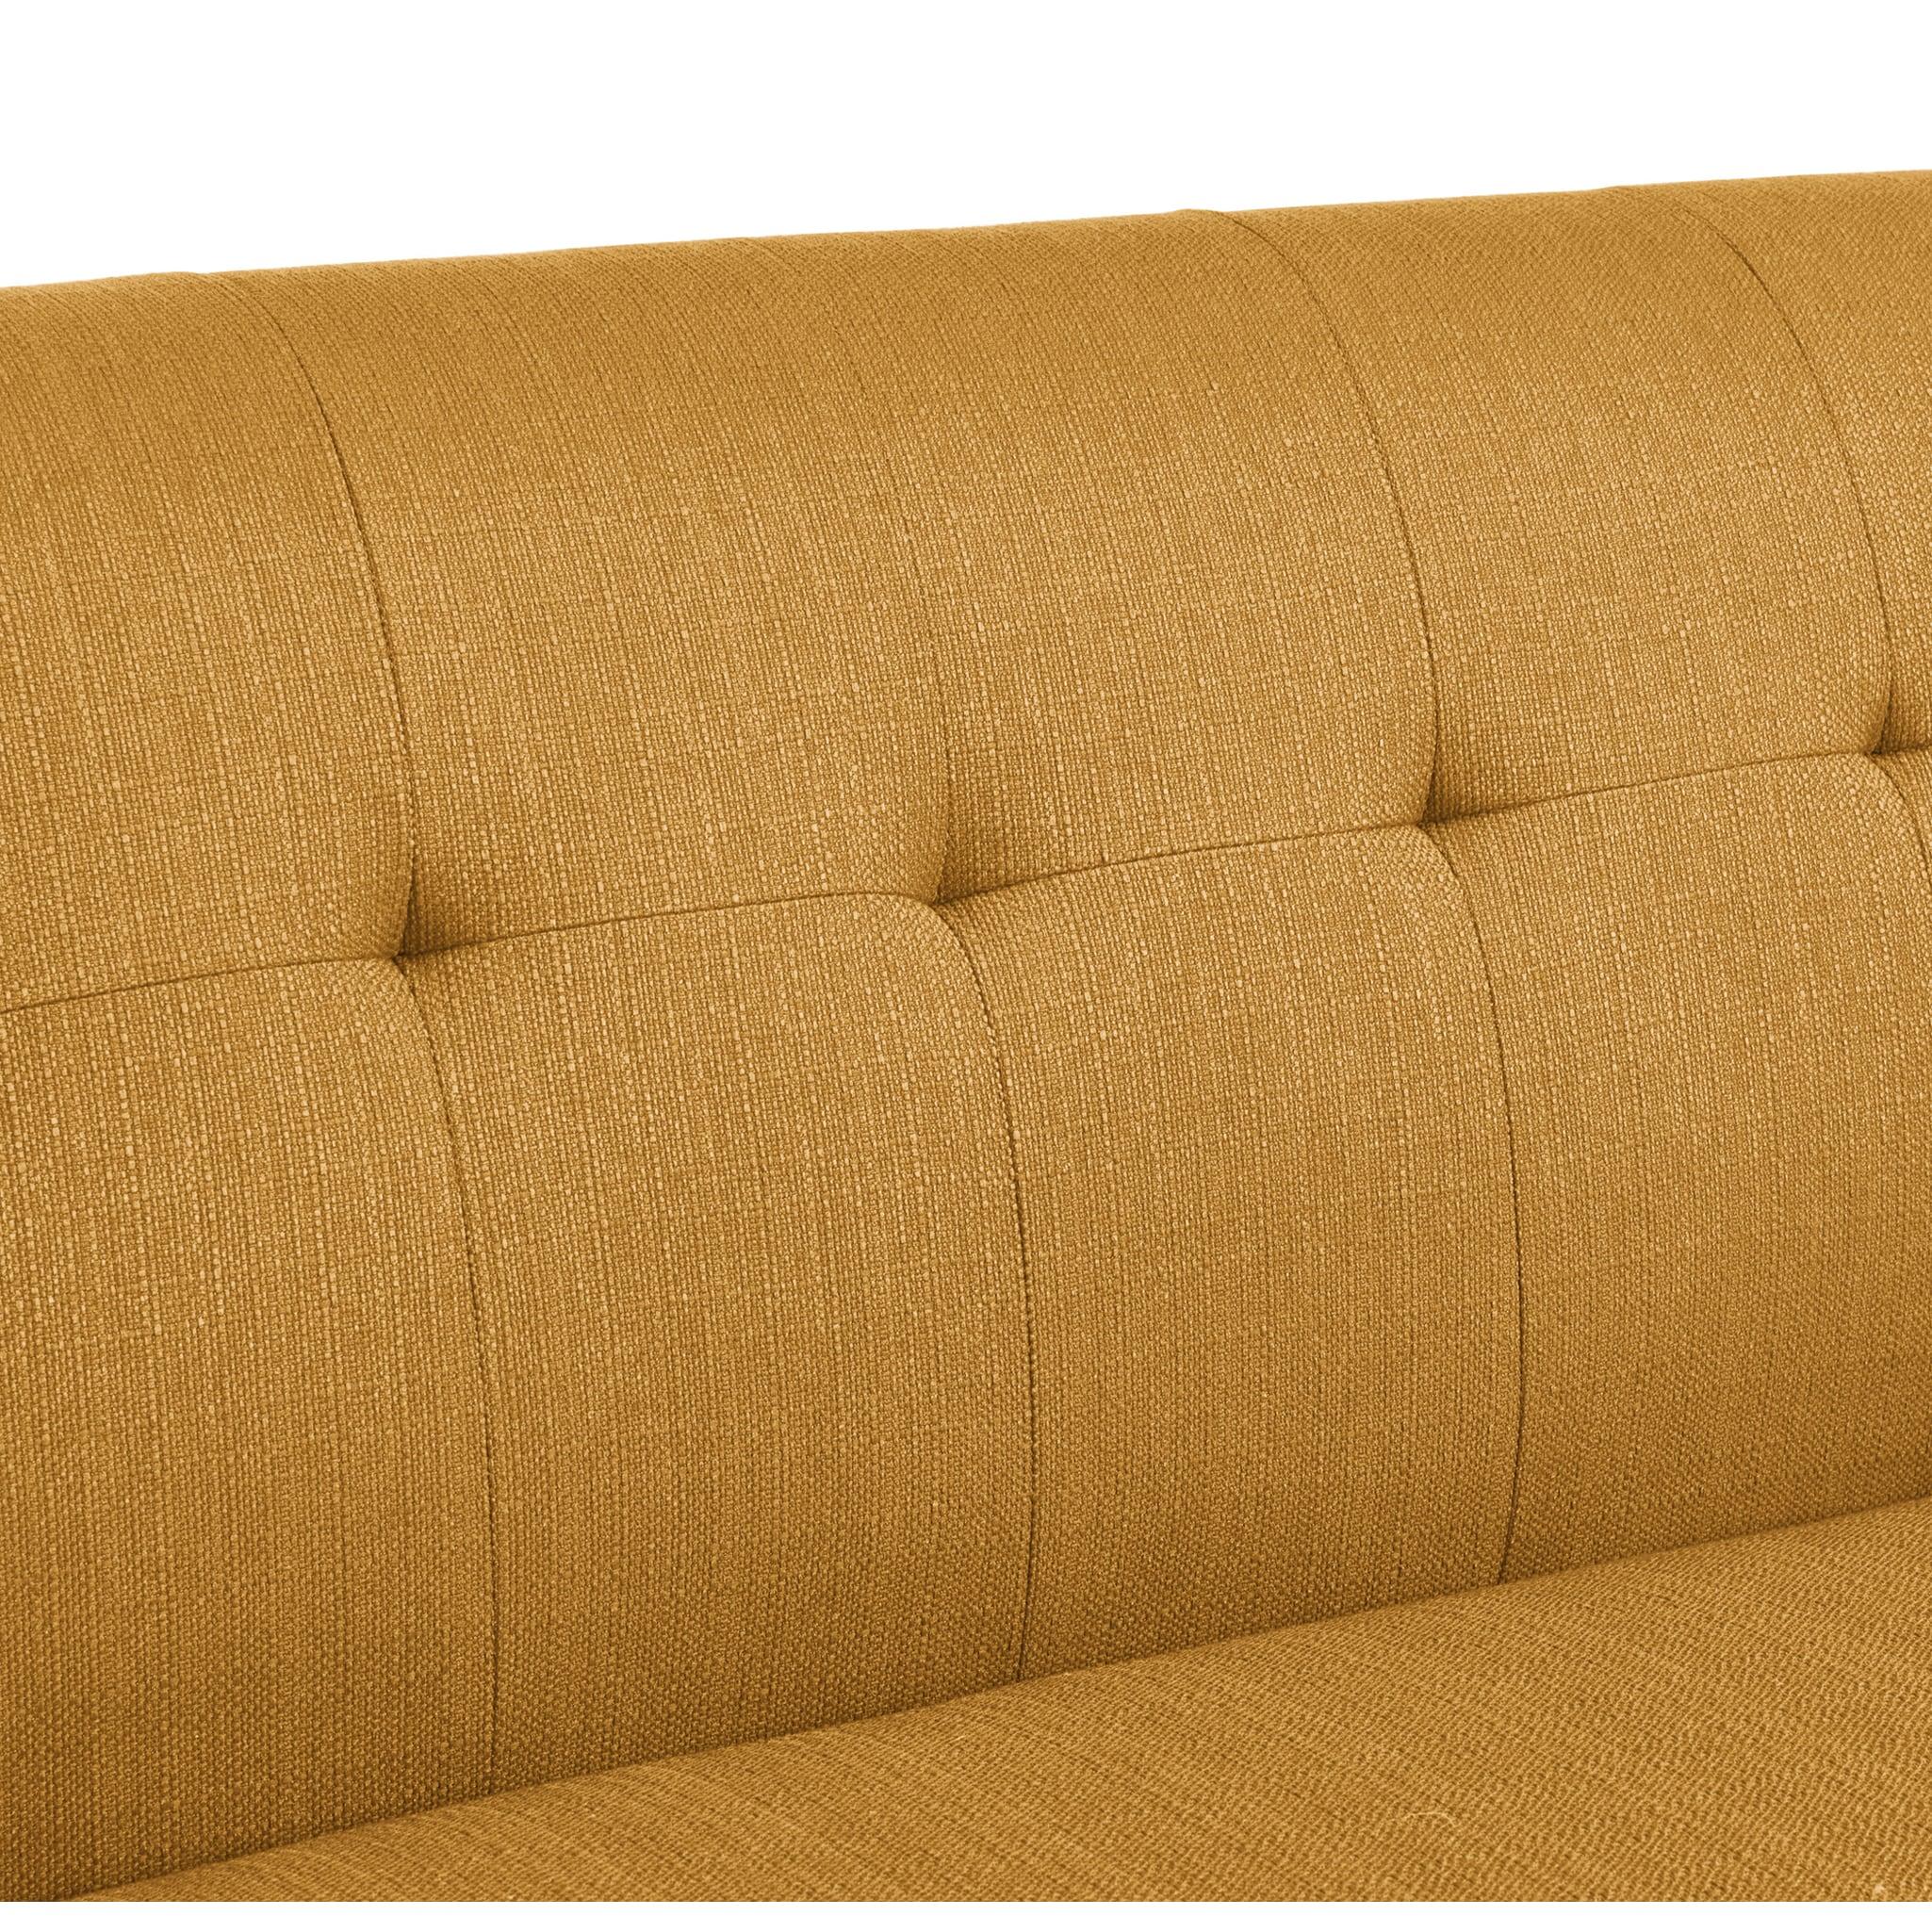 New Handy Living Kingston Mid Century Modern Mustard Yellow Linen  XY35